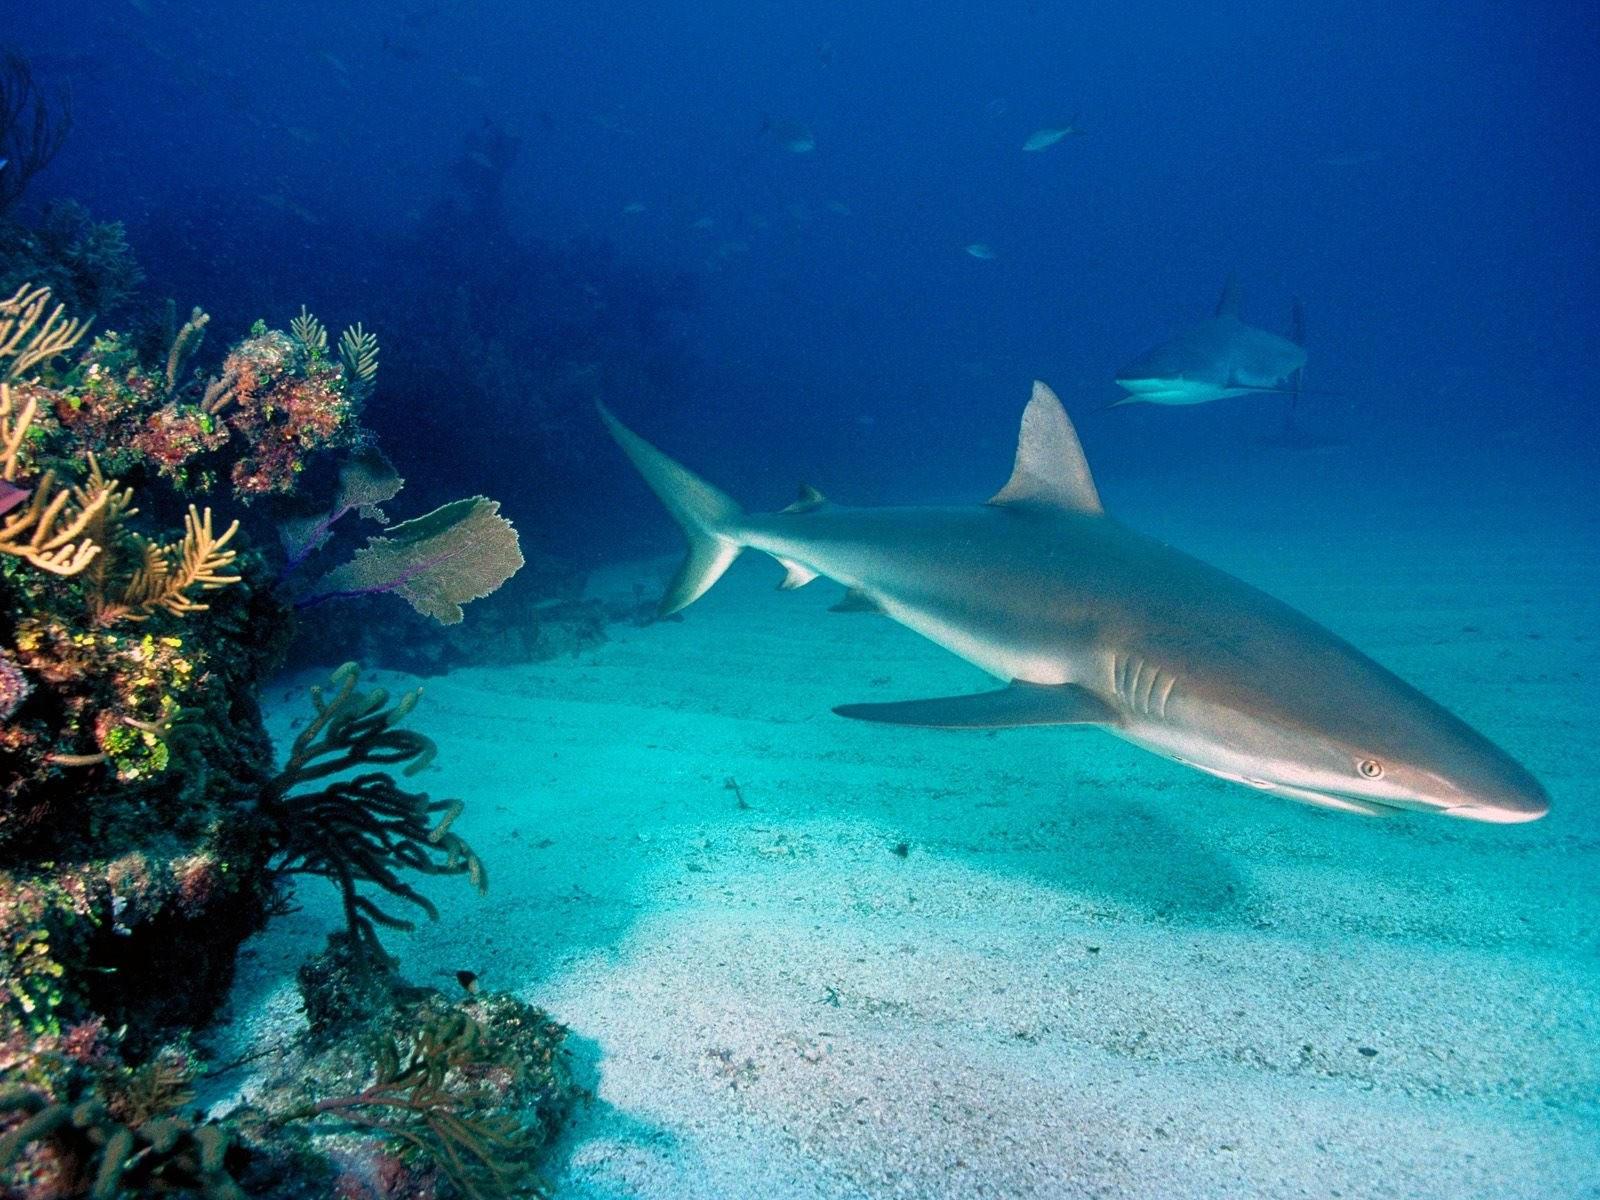 Акула на дне океана